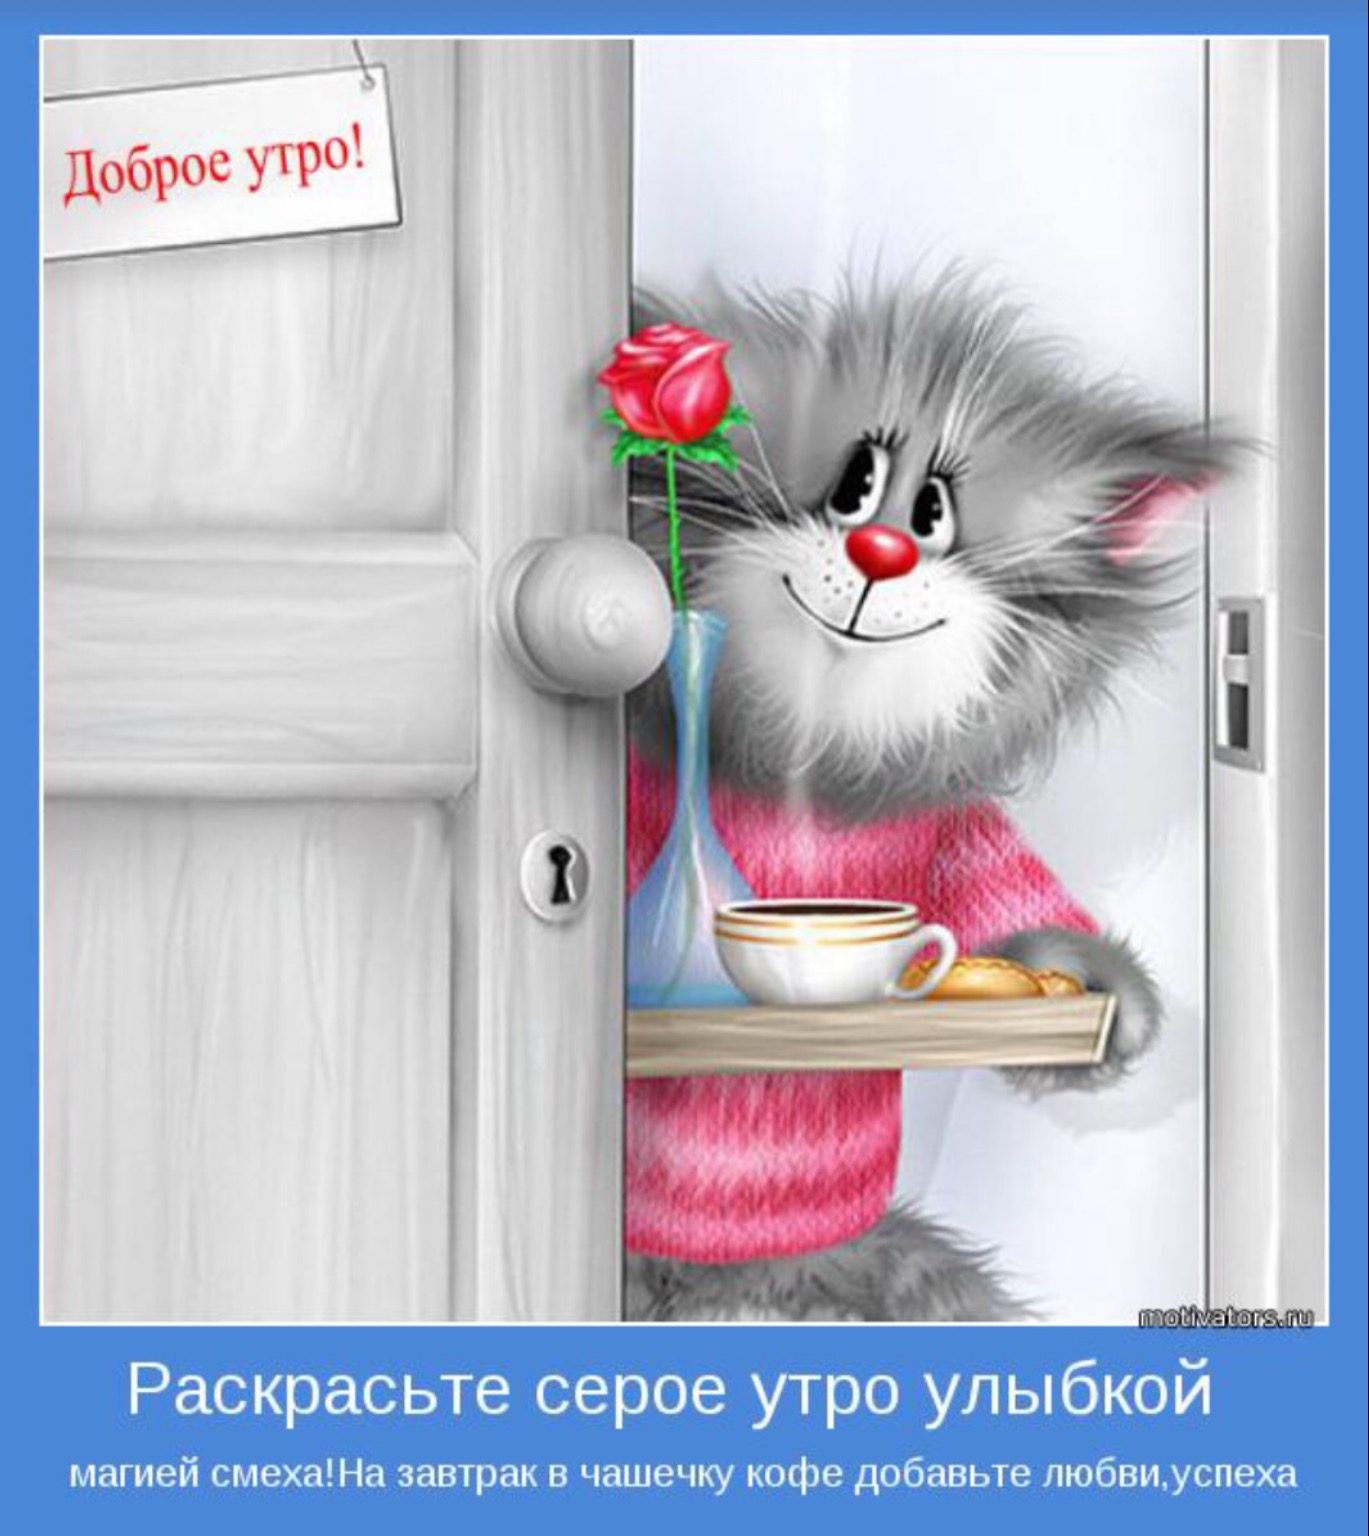 Пожелания доброго утра - m 44